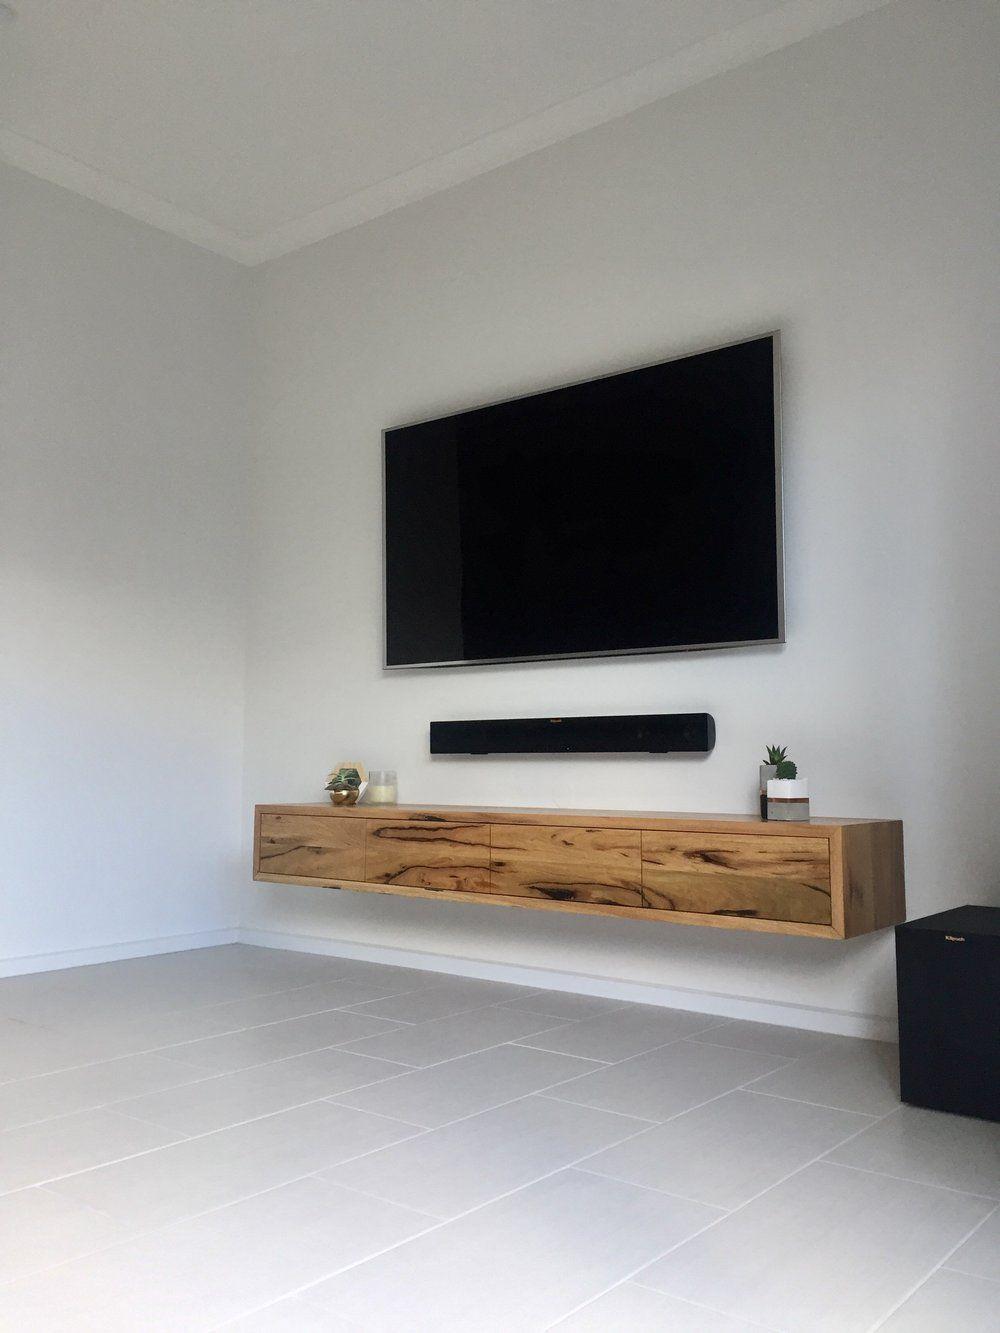 Collie floating tv unit ingrain living room tv wall